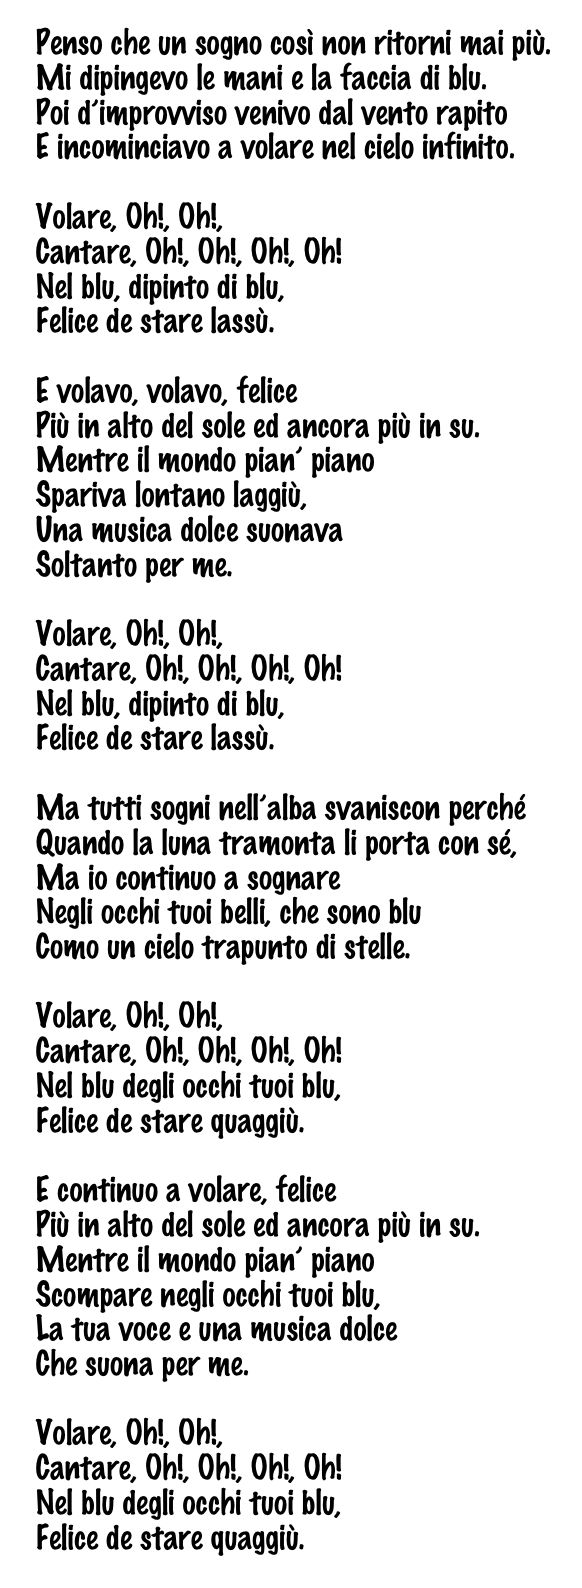 Nel Blu Dipinto Di Blu In The Blue Painted Blue Popularly Known As Volare Is A Song Recorded By Aprender Italiano Vocabulario Italiano Idioma Italiano